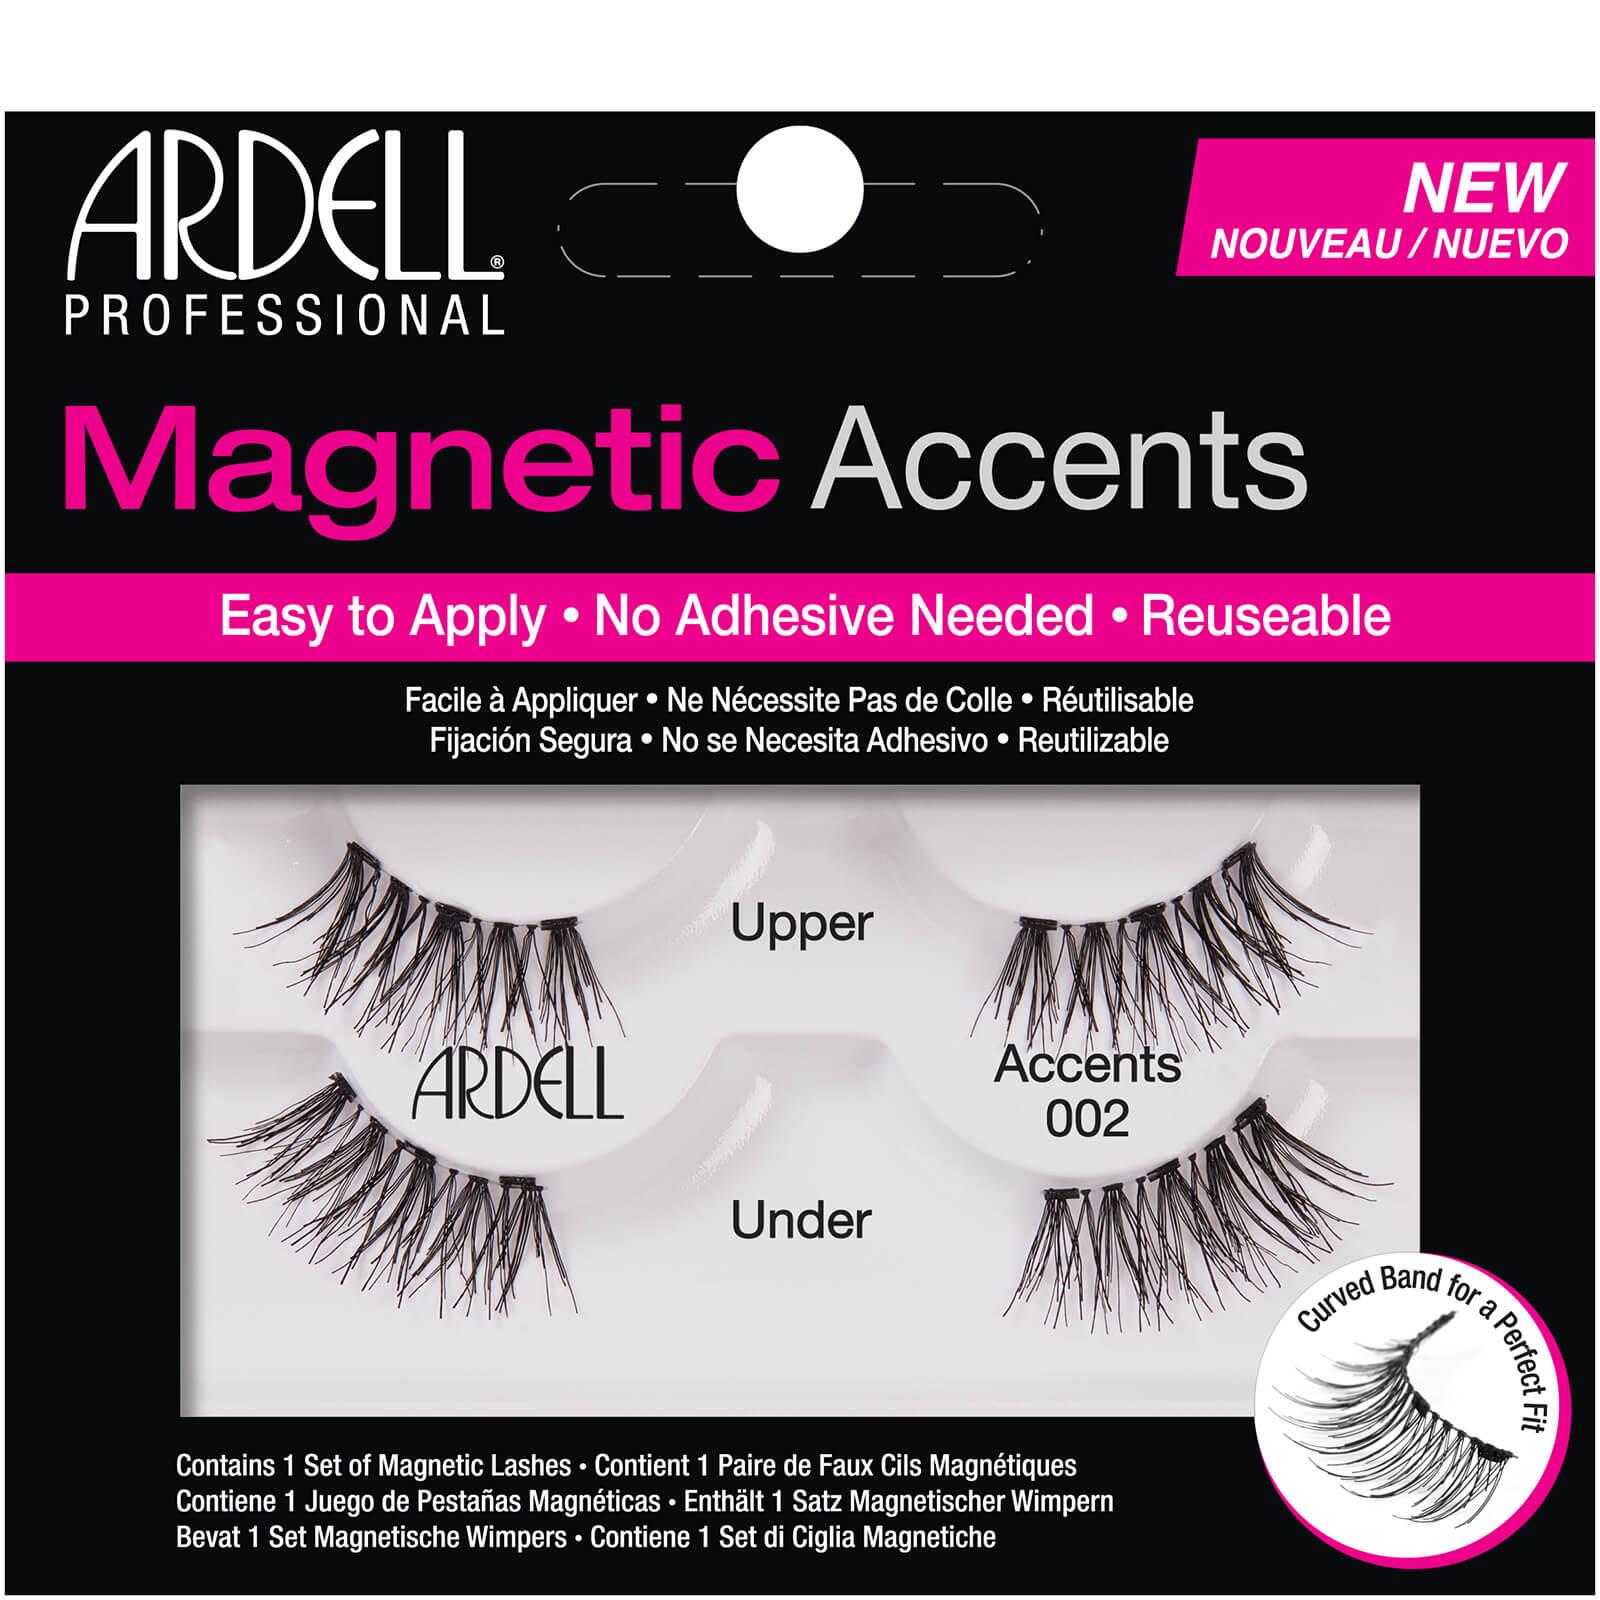 f0be819166f Ardell Magnetic Lash Natural Accents 002 False Eyelashes   Free Shipping    Lookfantastic